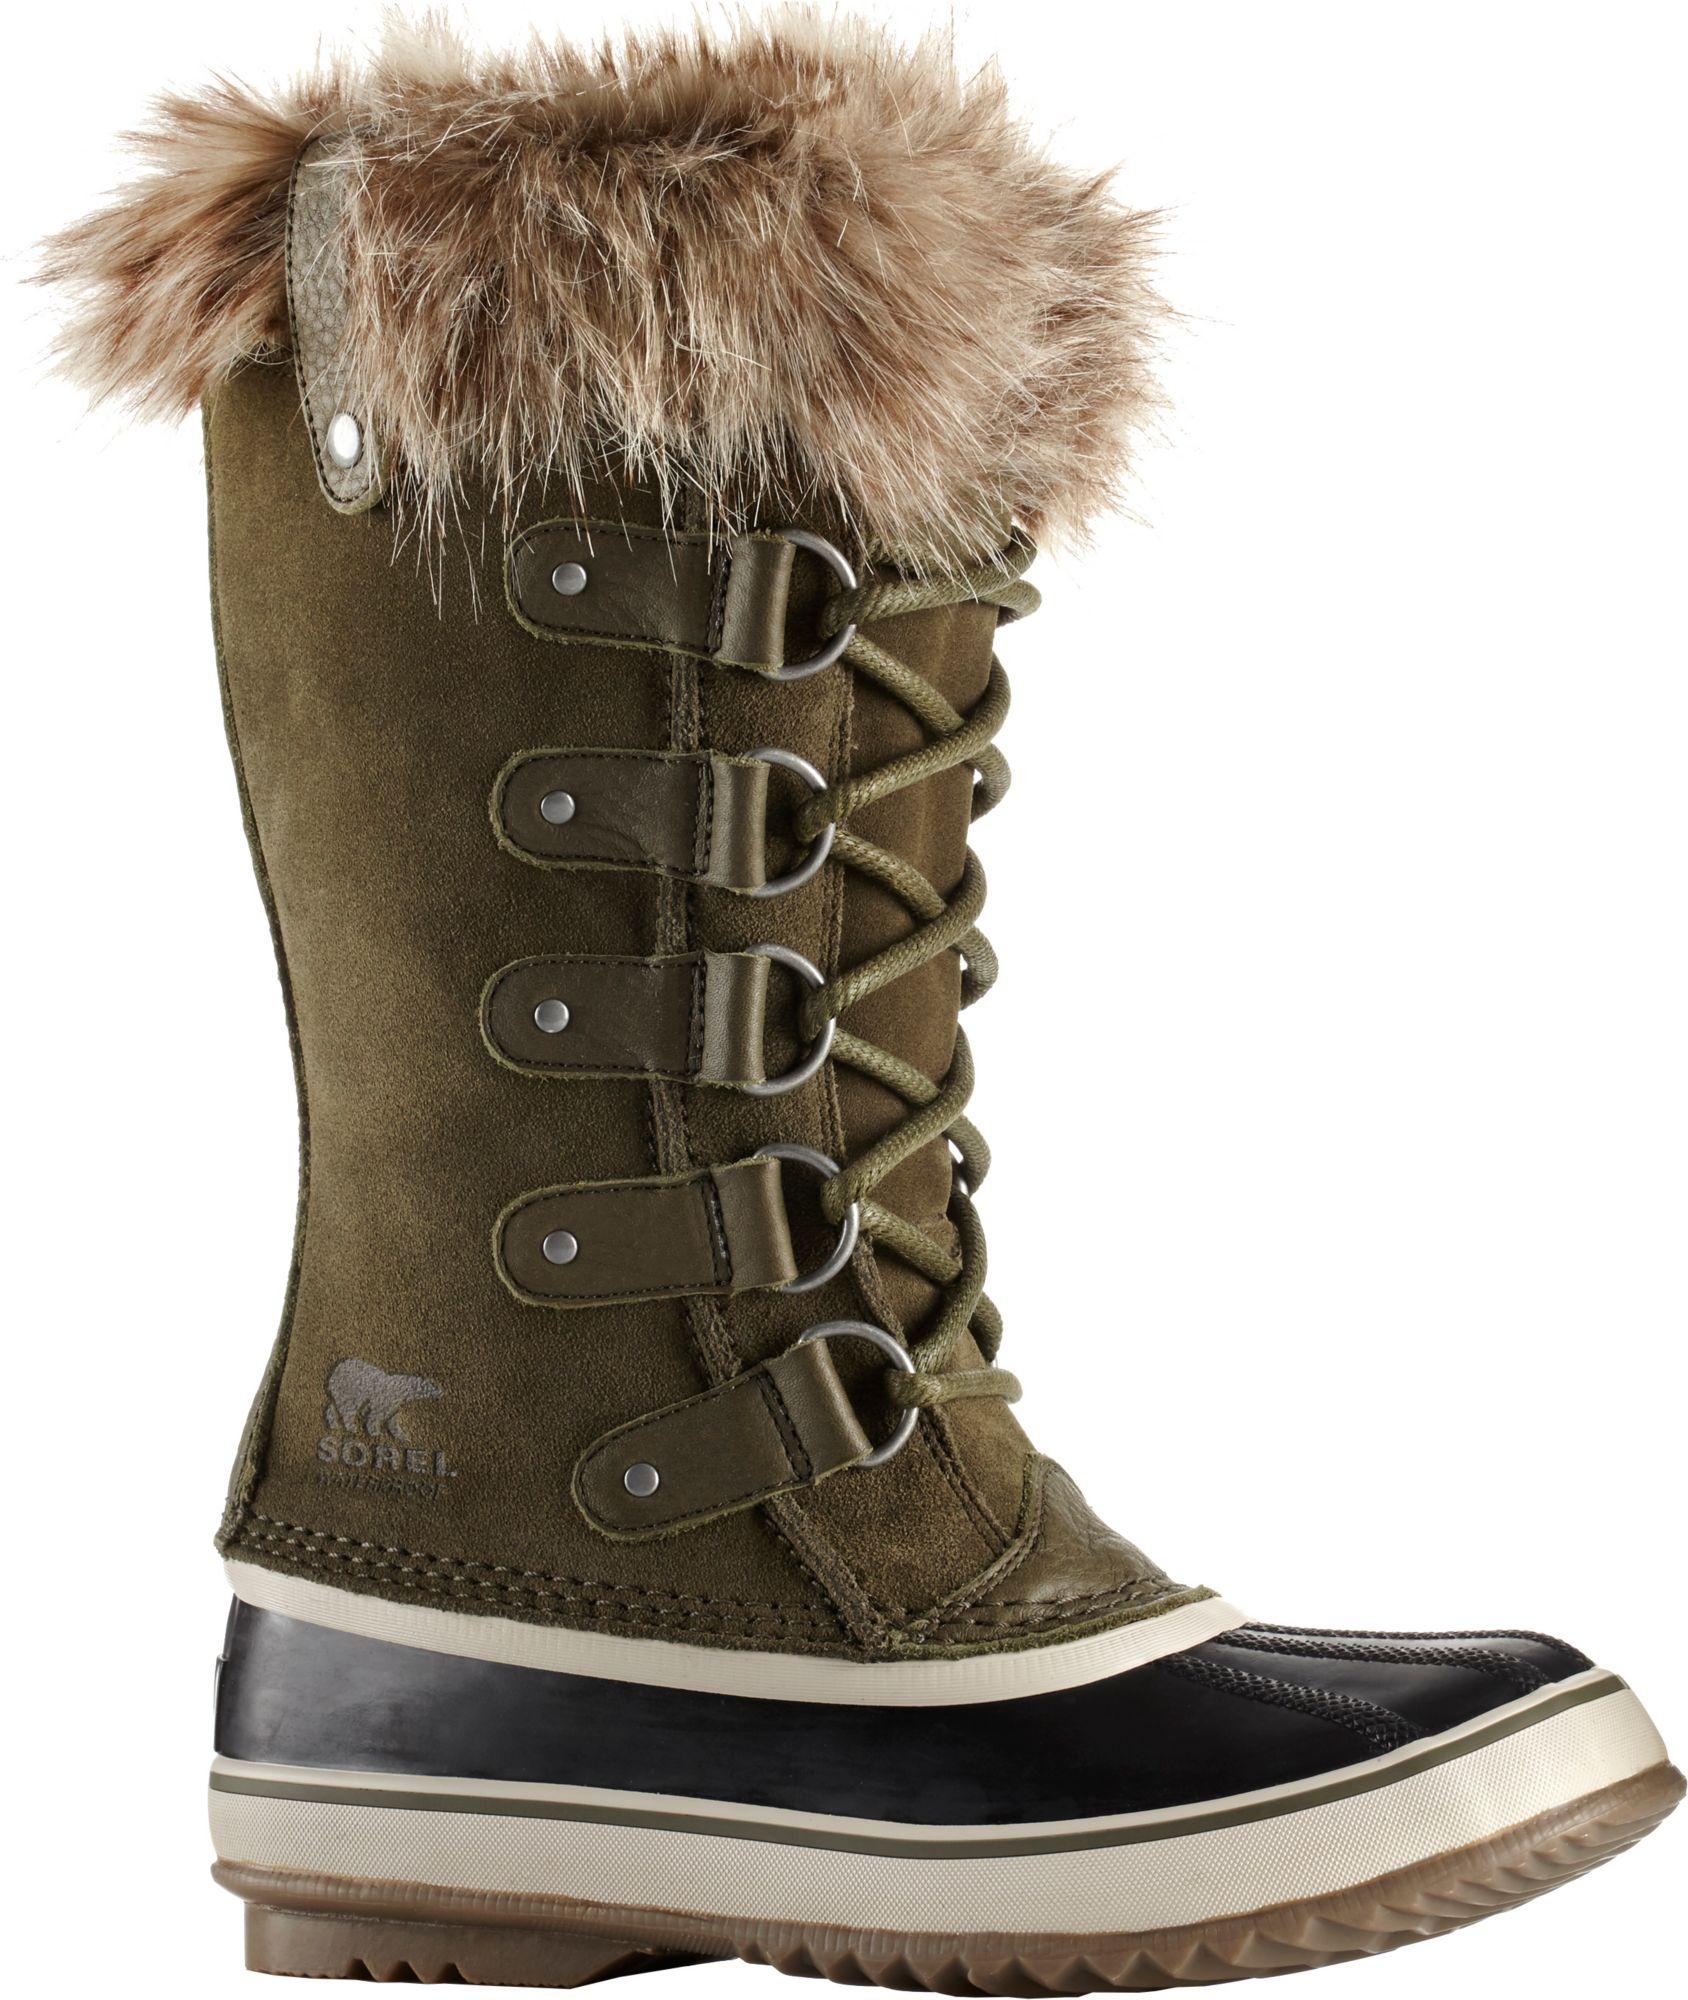 sorel joan of arctic boots noimagefound ??? xhnbckr